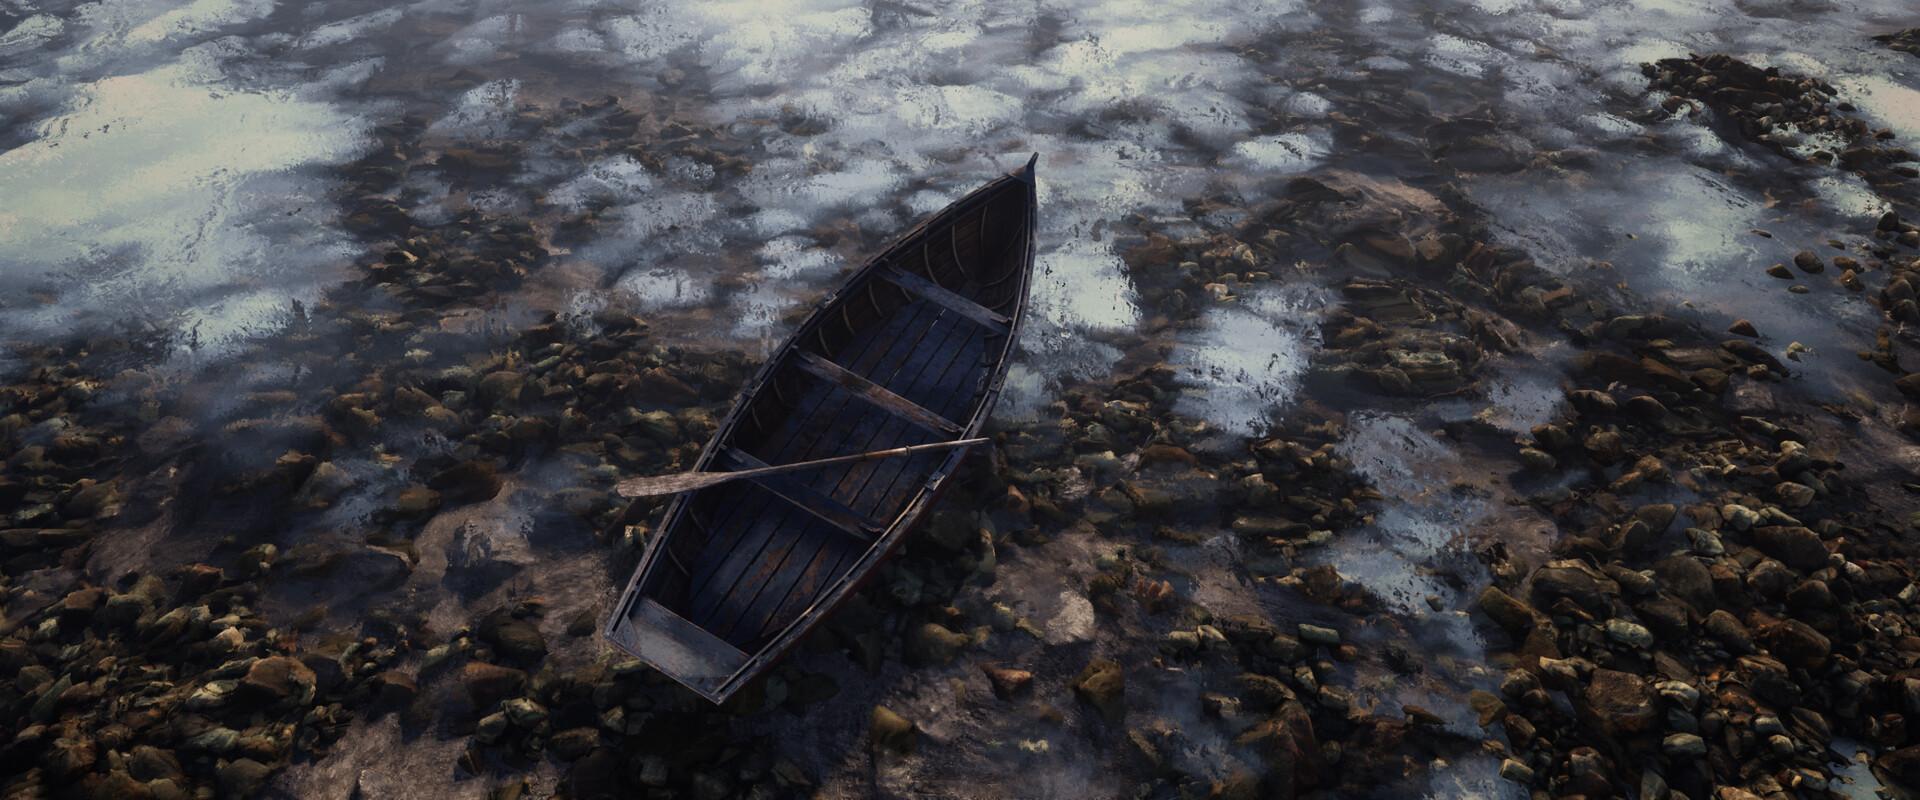 B o w qin ice lake ue4 d shot02